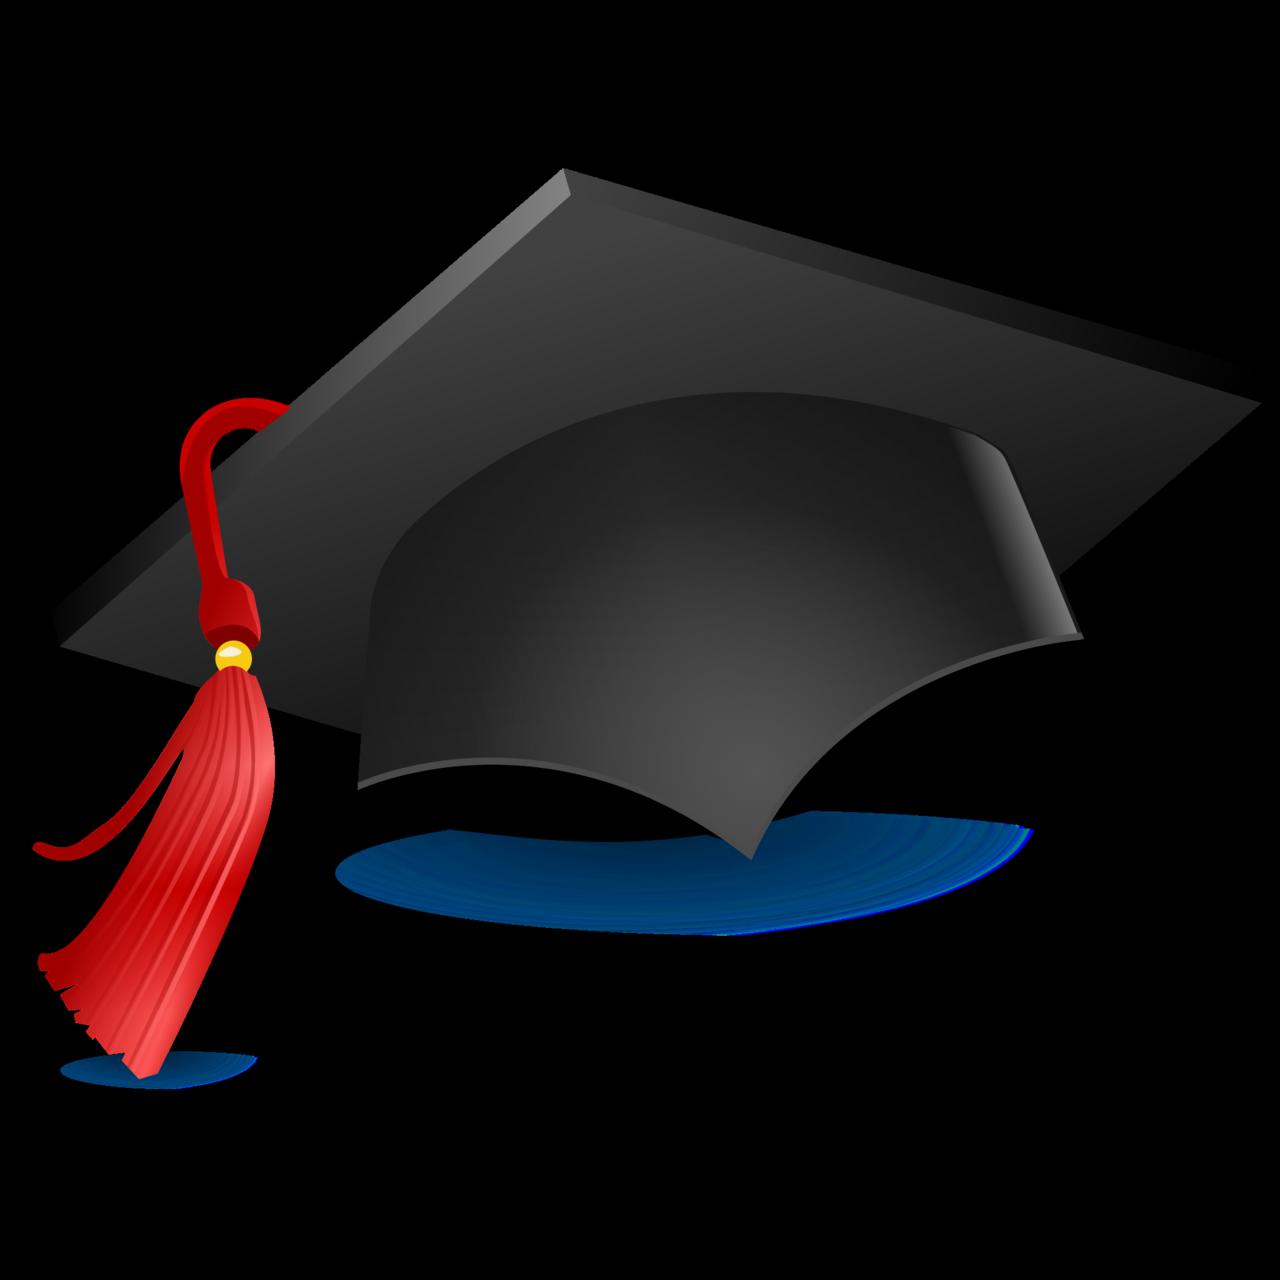 College clipart scholarship recipient. Buckfire p c disability